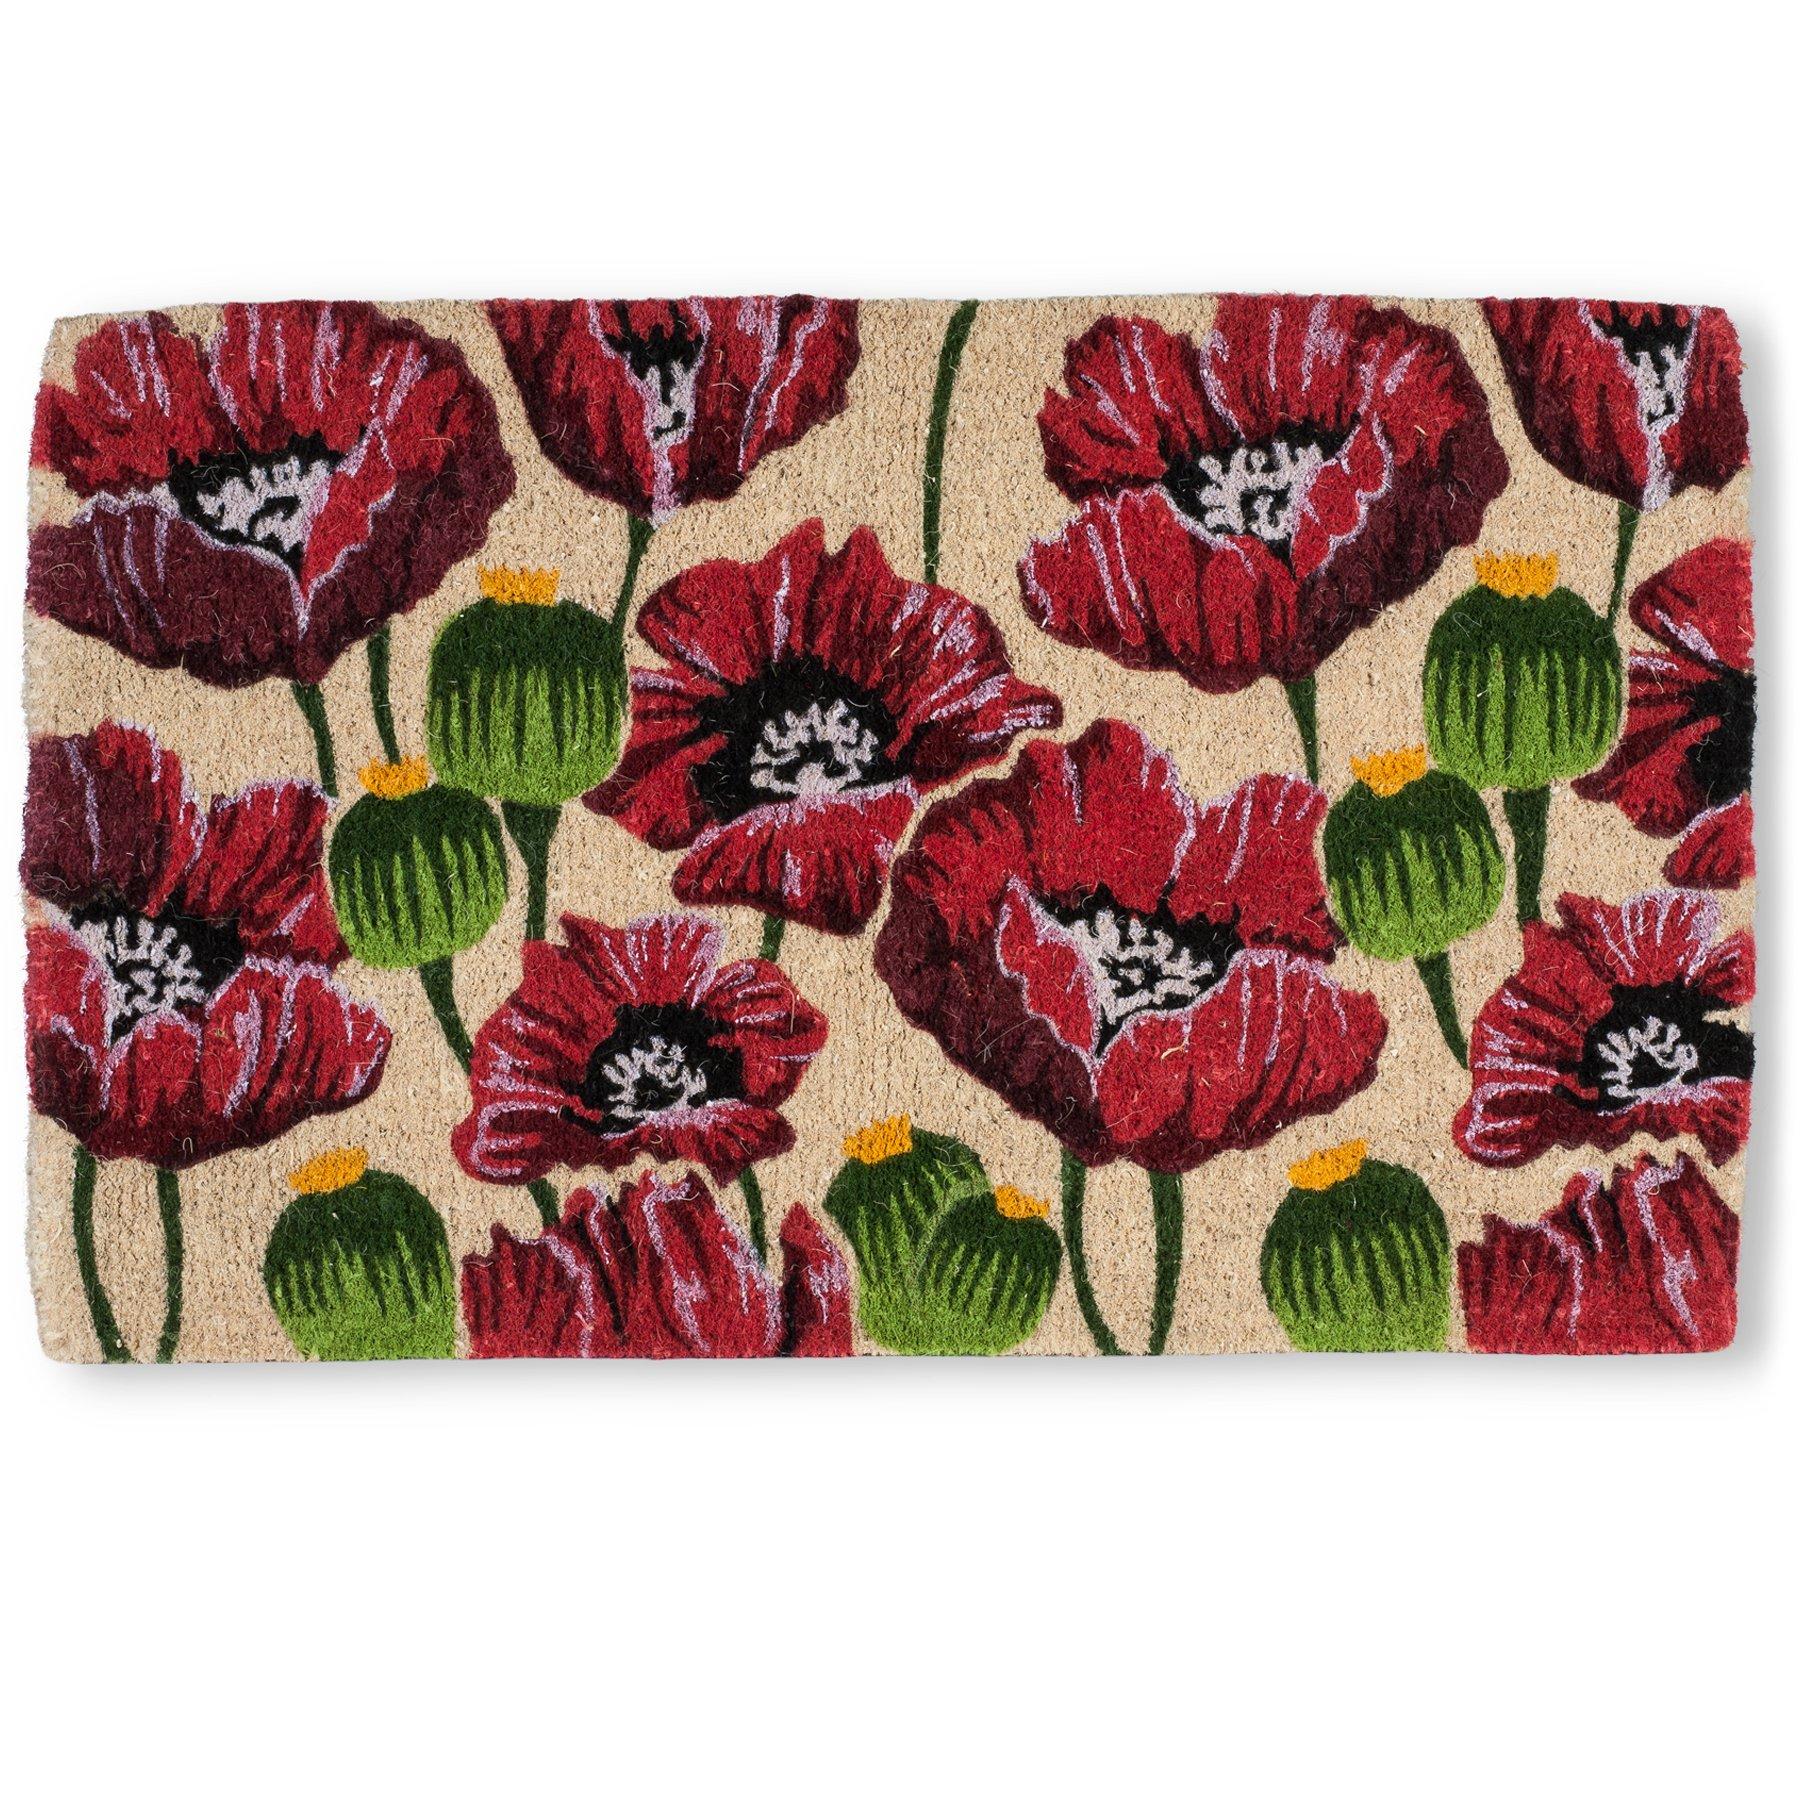 Abbott Collection Coir Poppy Doormat (Extra Large)